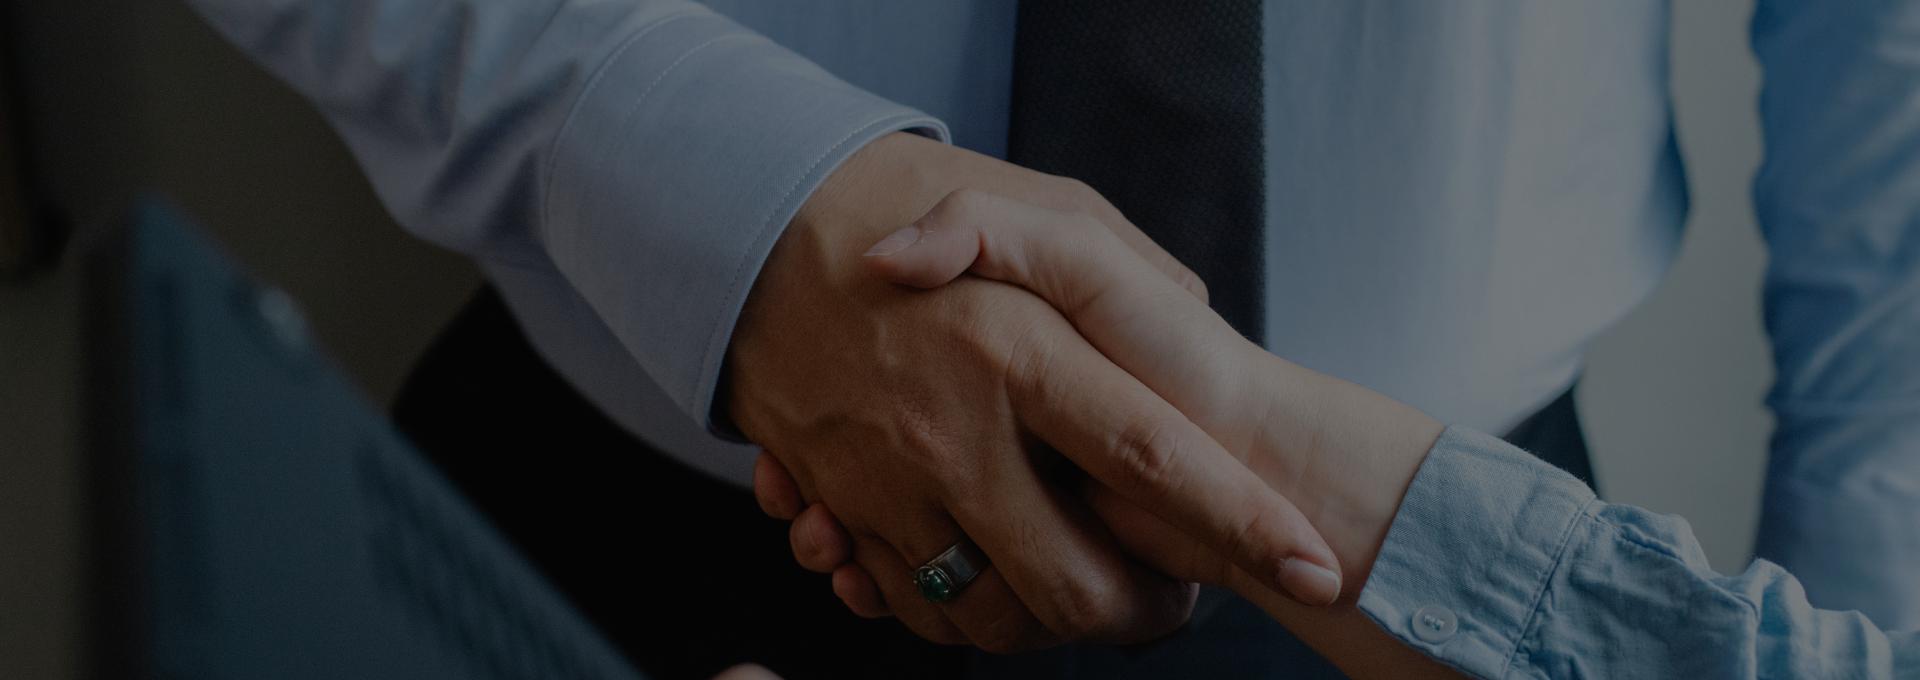 Asset Management Company Analyzes Churn to Retain 50% of Passive Customers